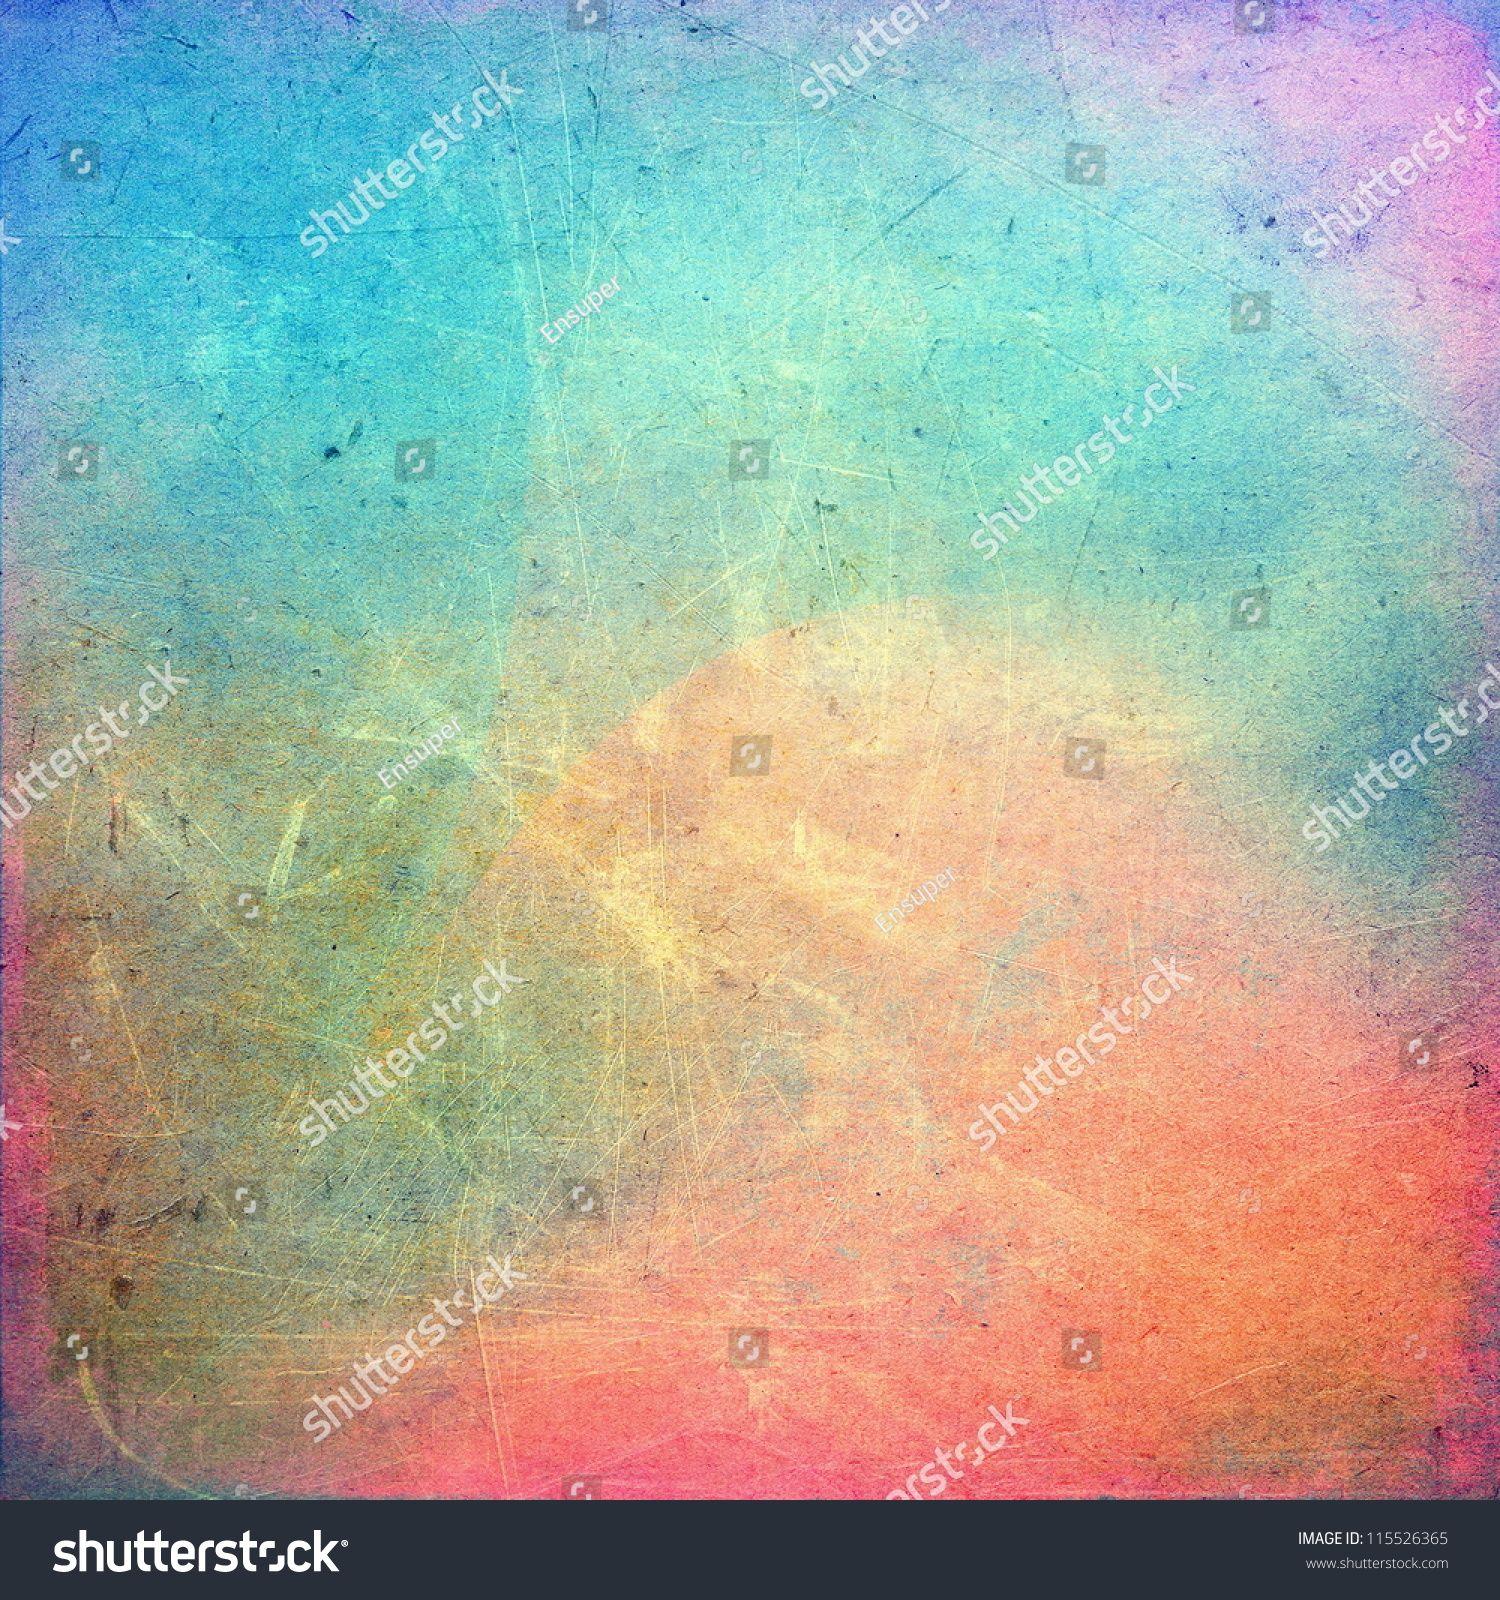 Colorful Scratched Vintage Background Sponsored Ad Scratched Colorful Background Vintage With Images Background Vintage Colorful Backgrounds Textured Background